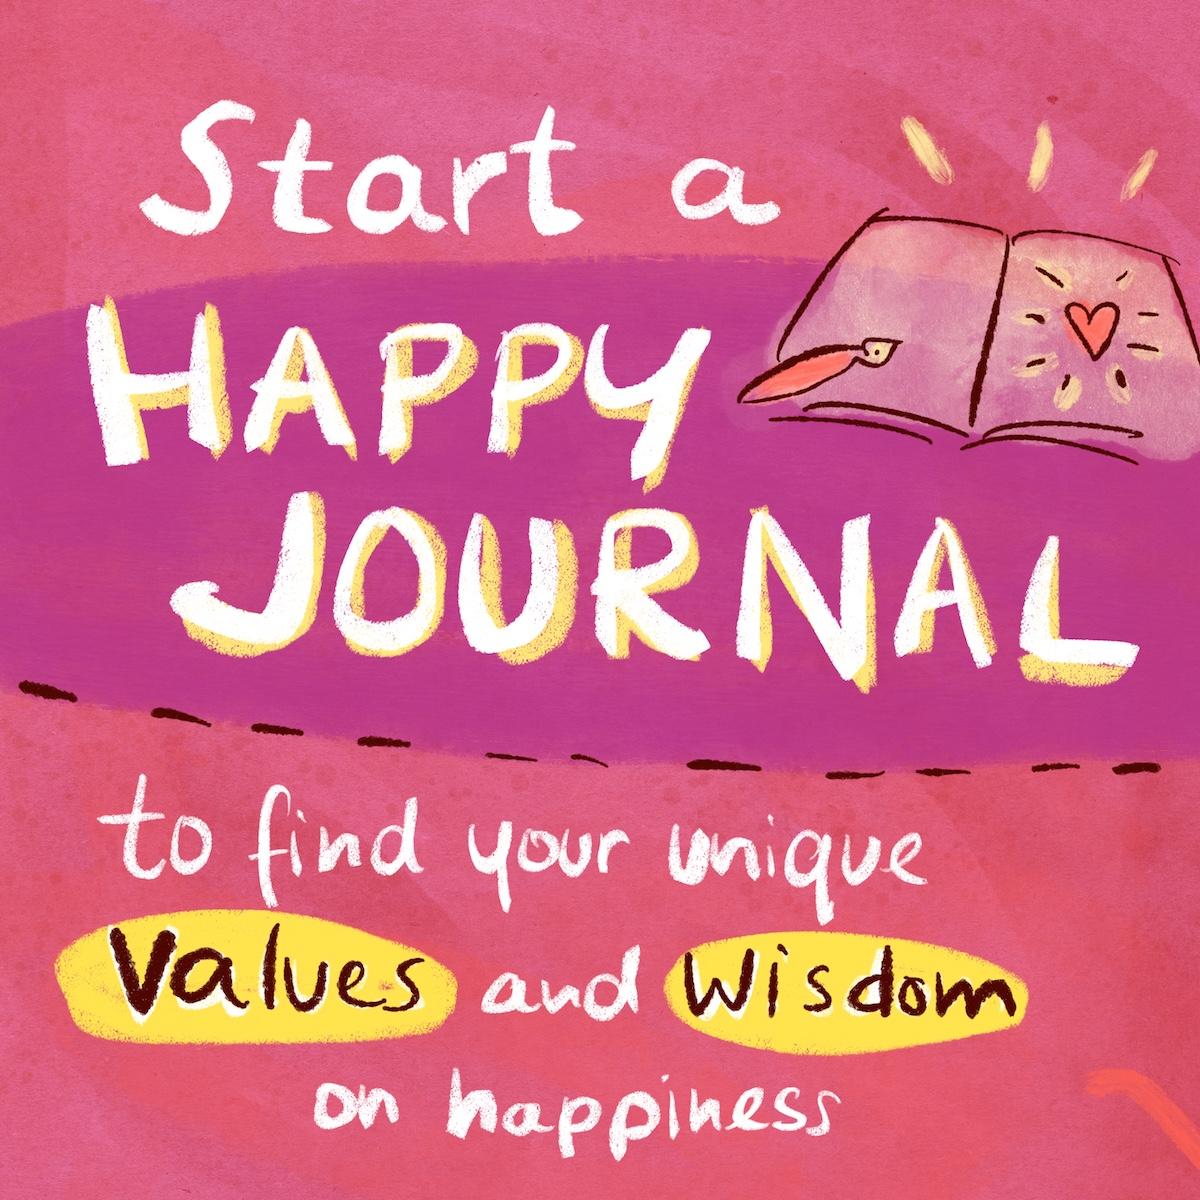 happy journal method